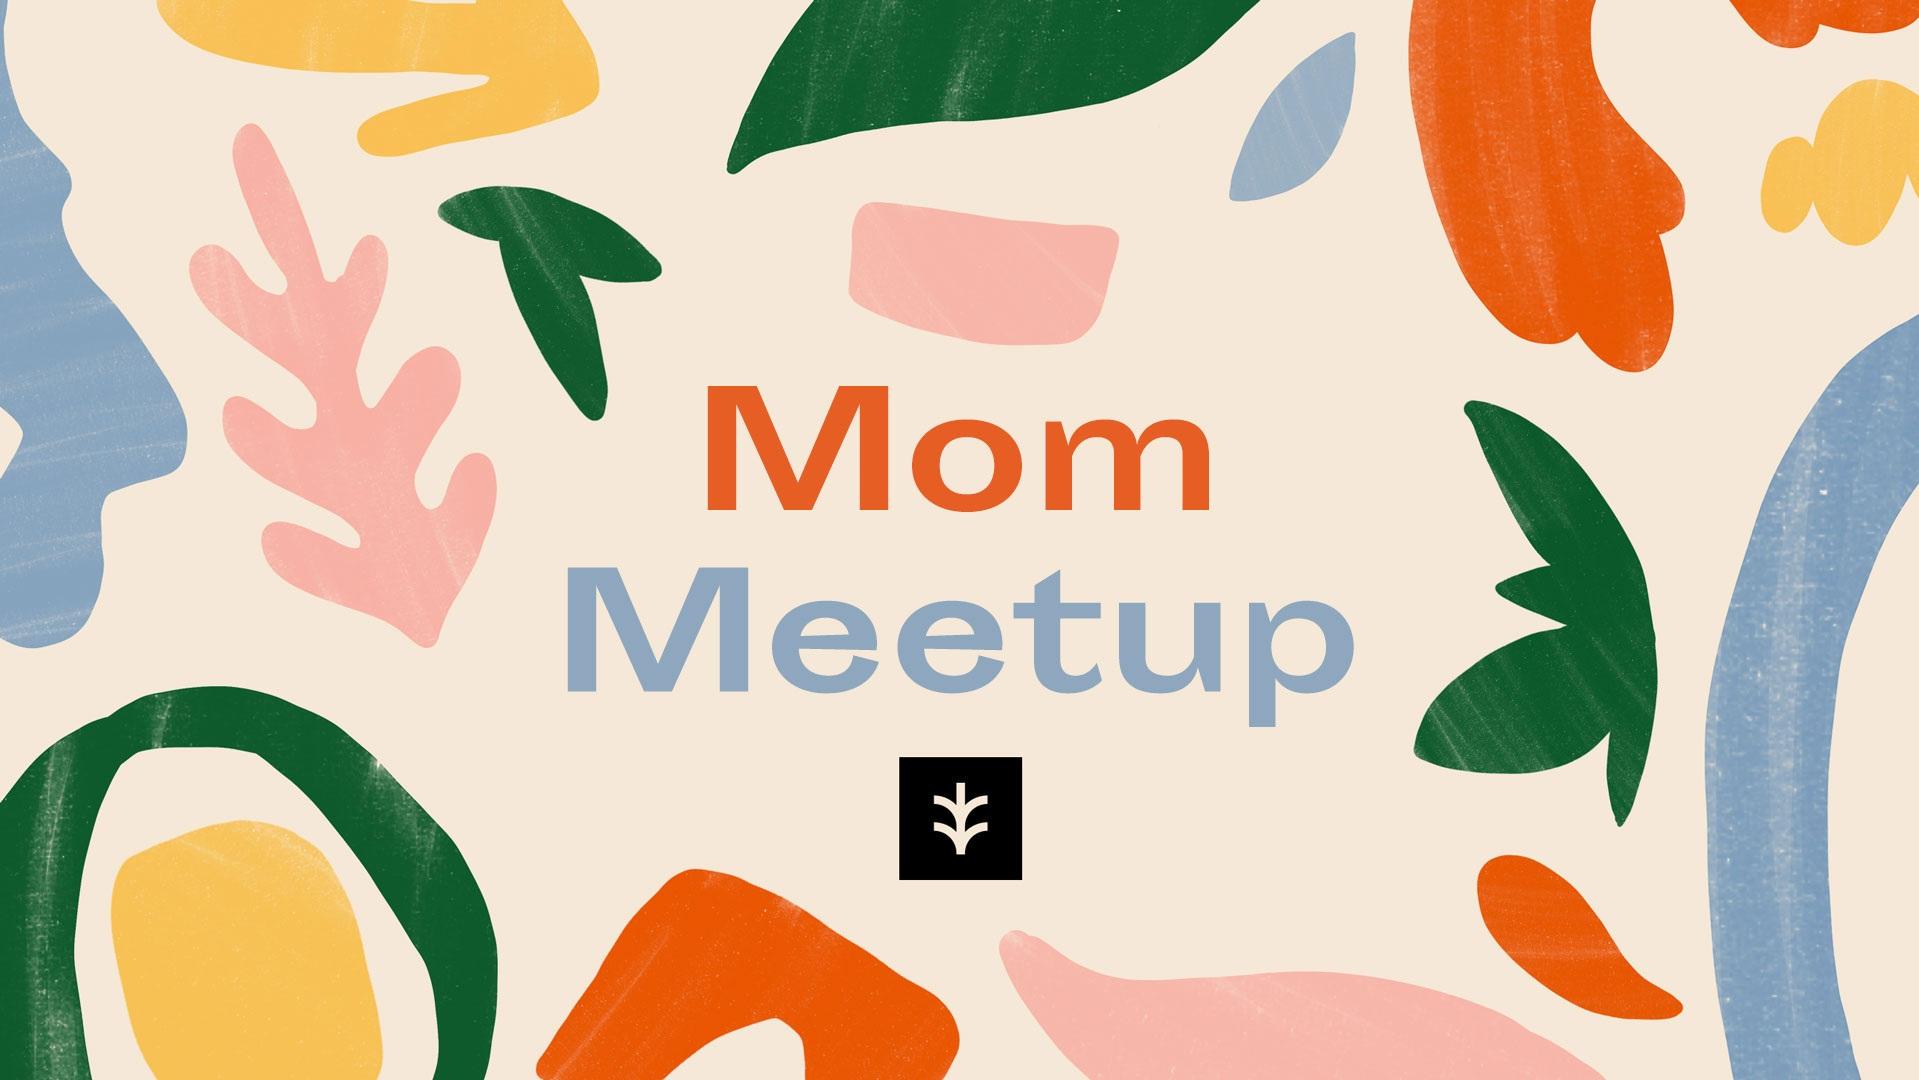 Moms_Meetup_Slide.jpg